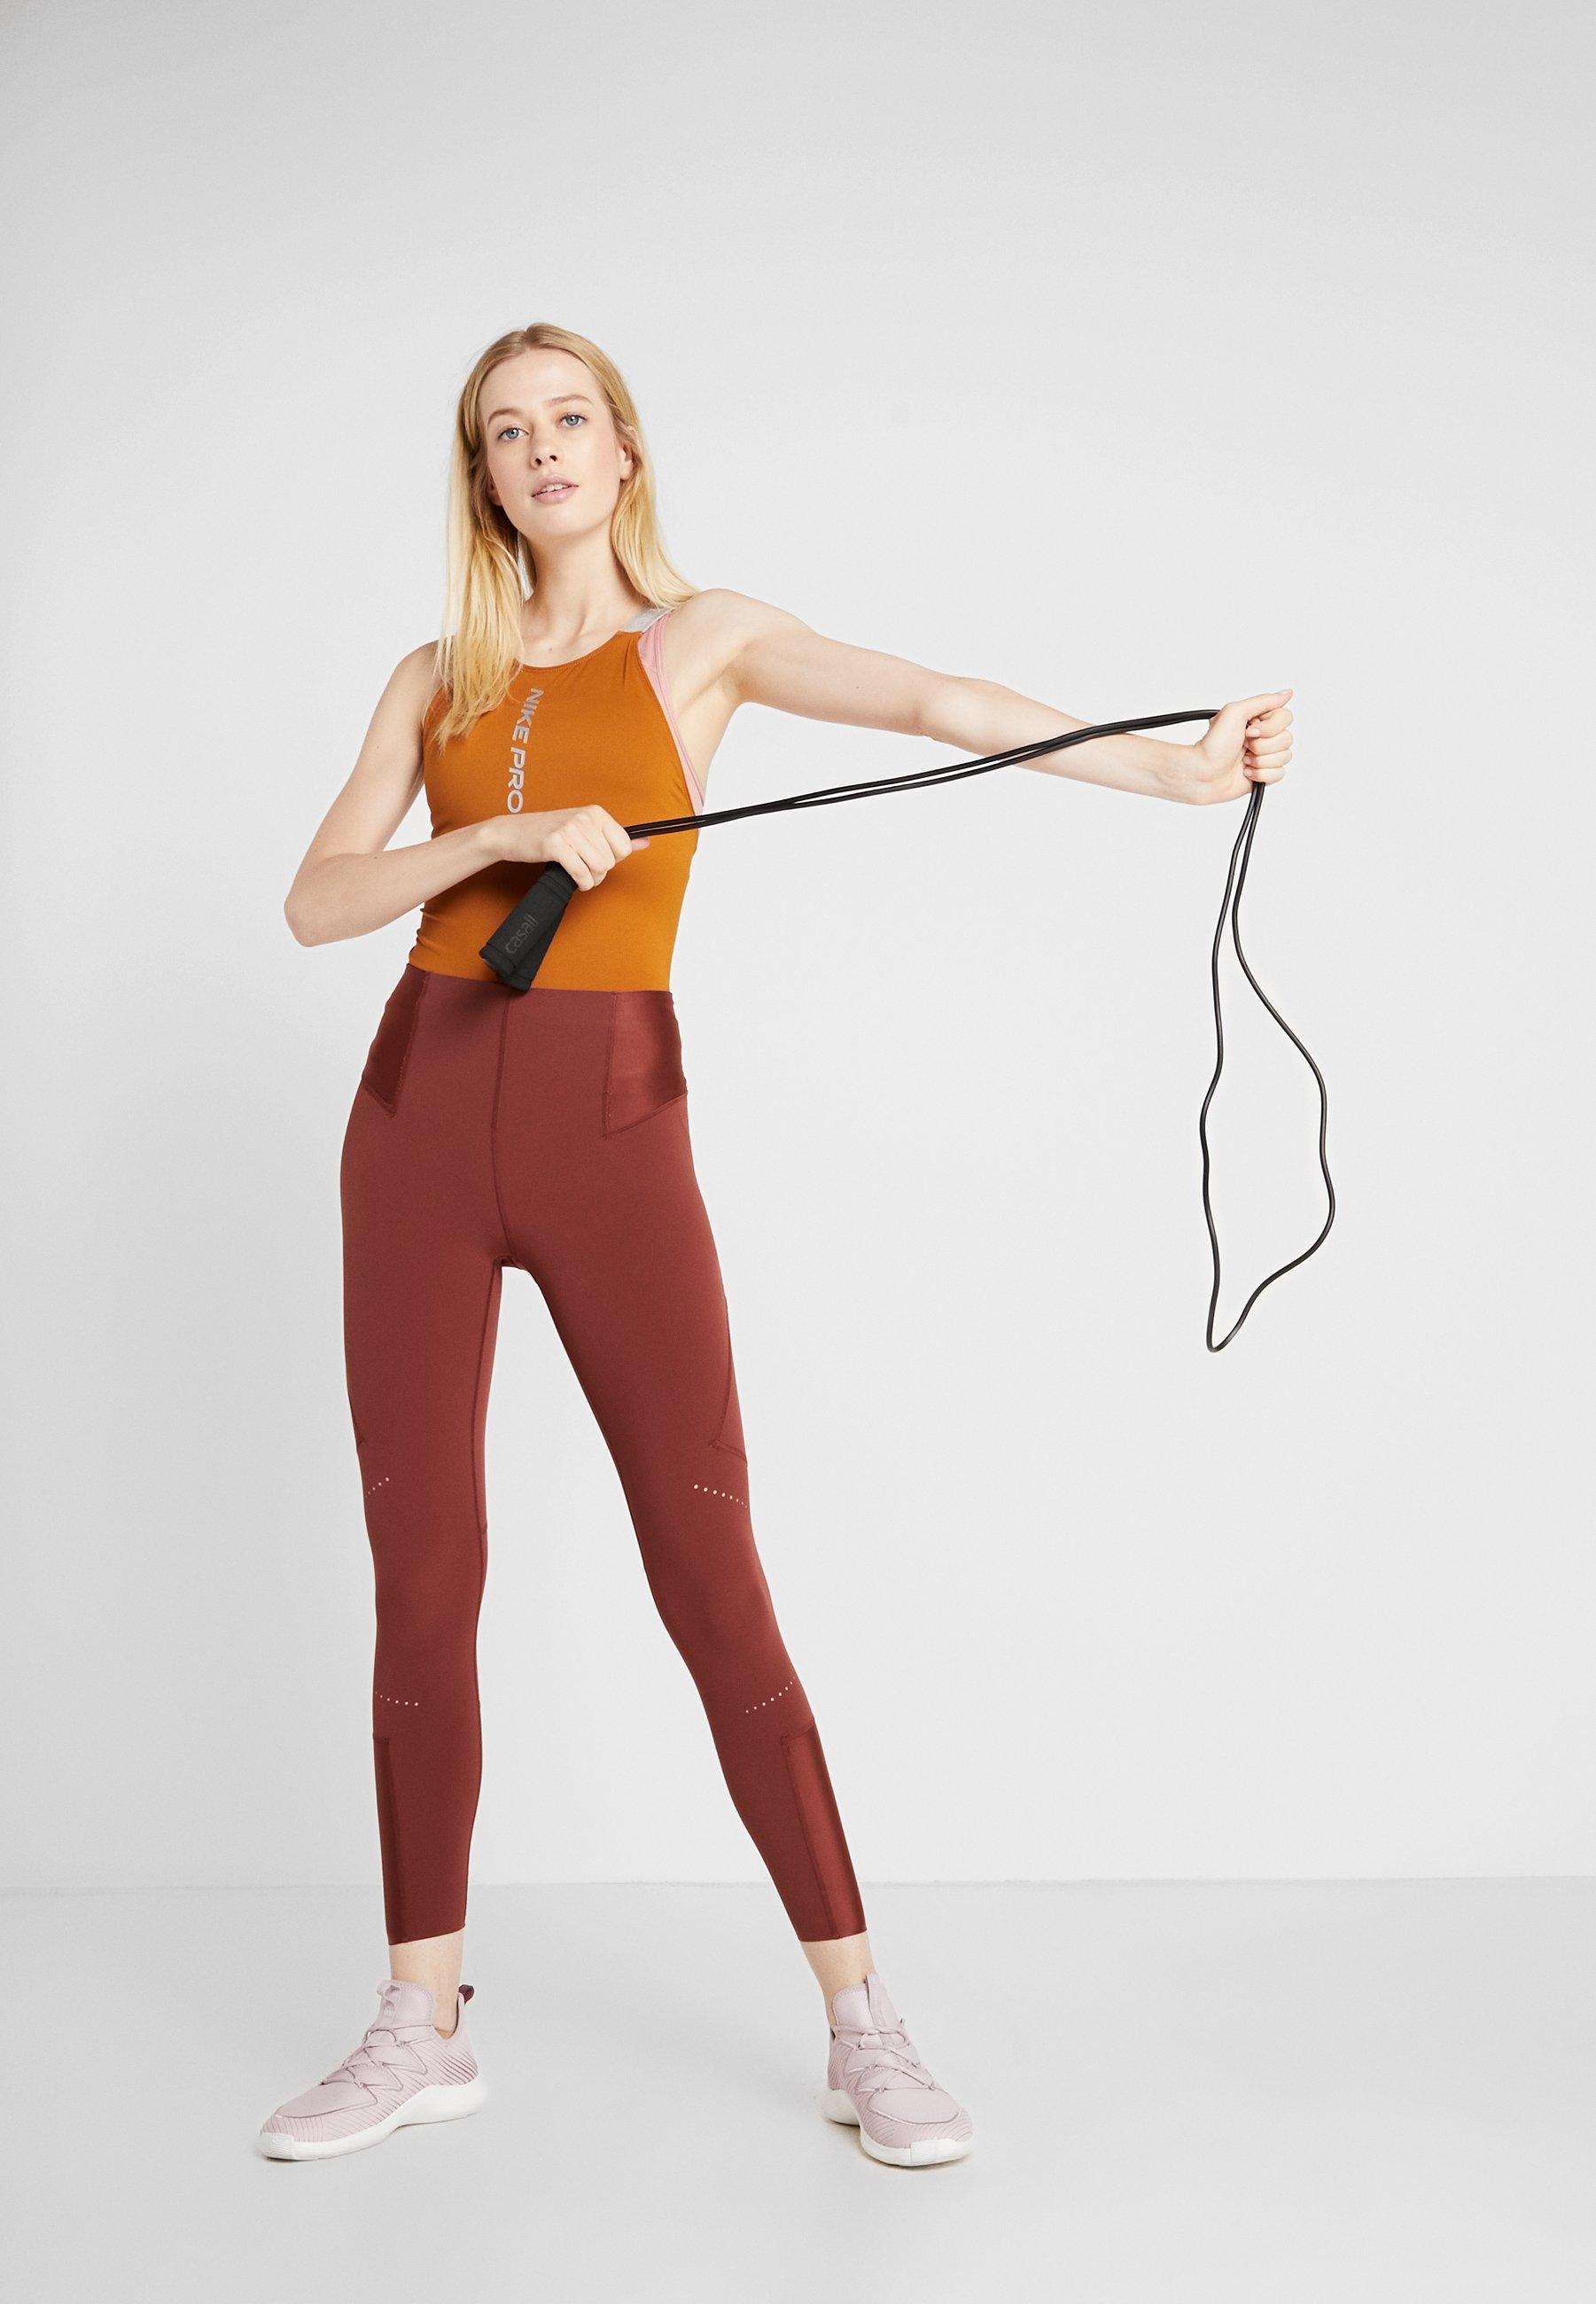 Femme JUMP ROPE HANDLE - Equipement de fitness et yoga